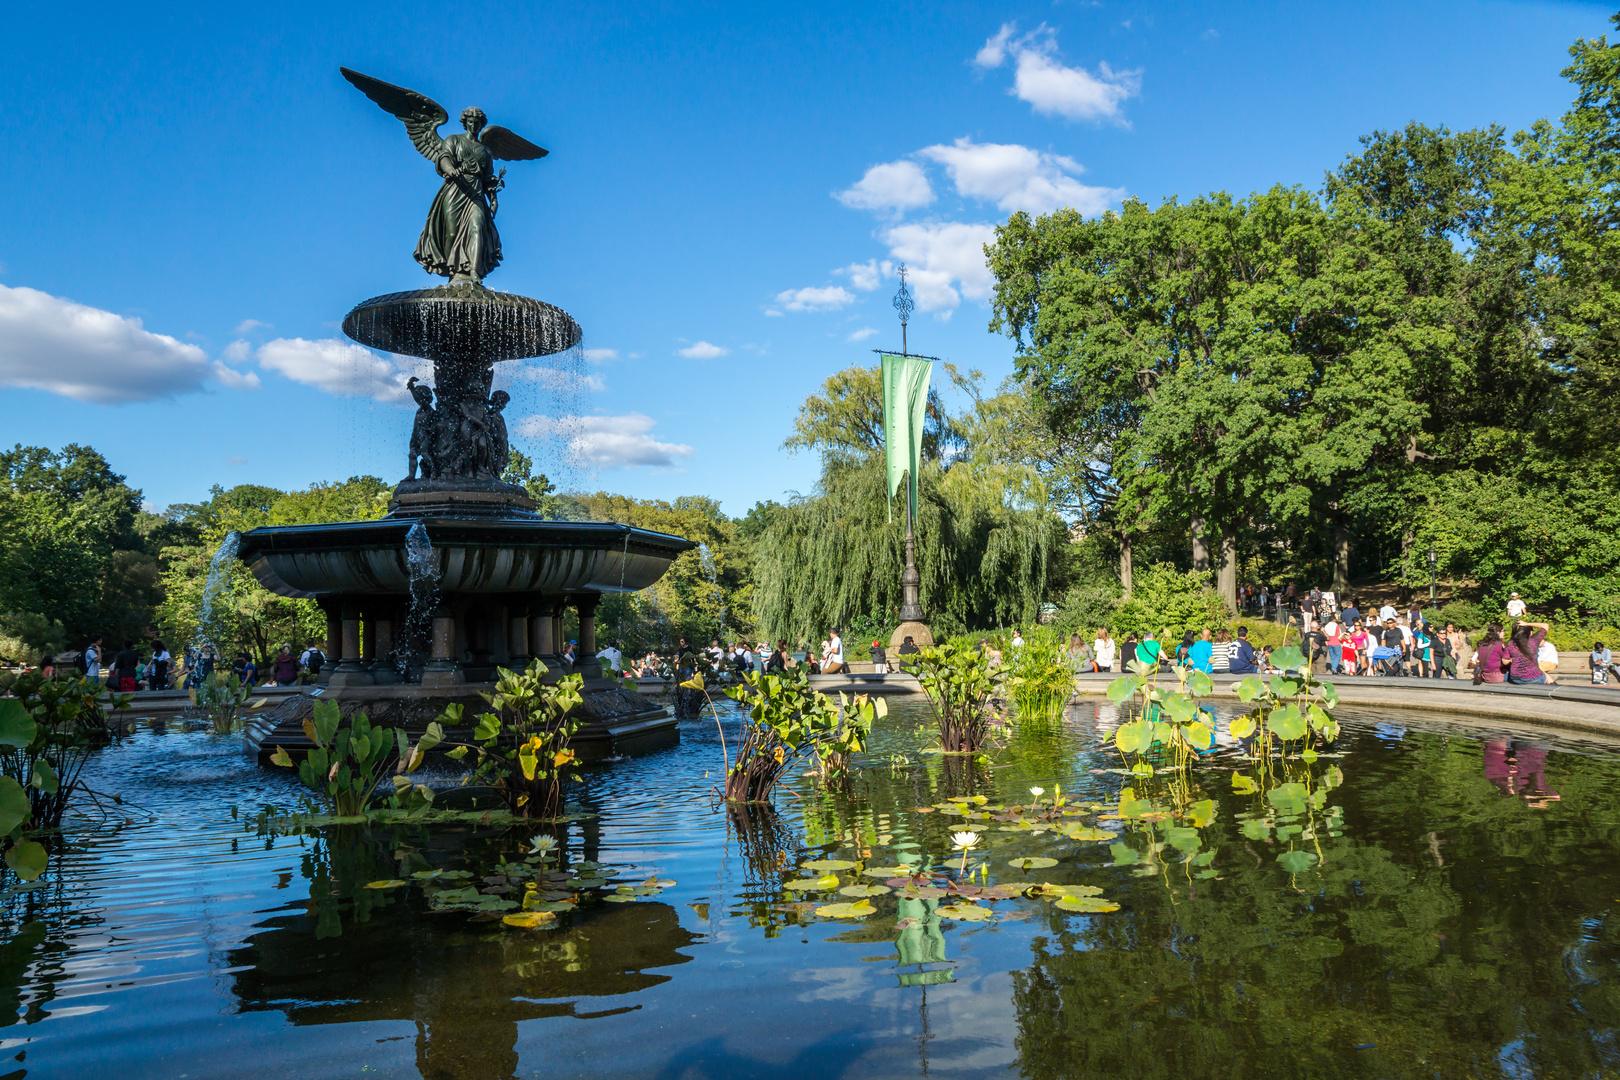 NYC Springbrunnen im Central Park